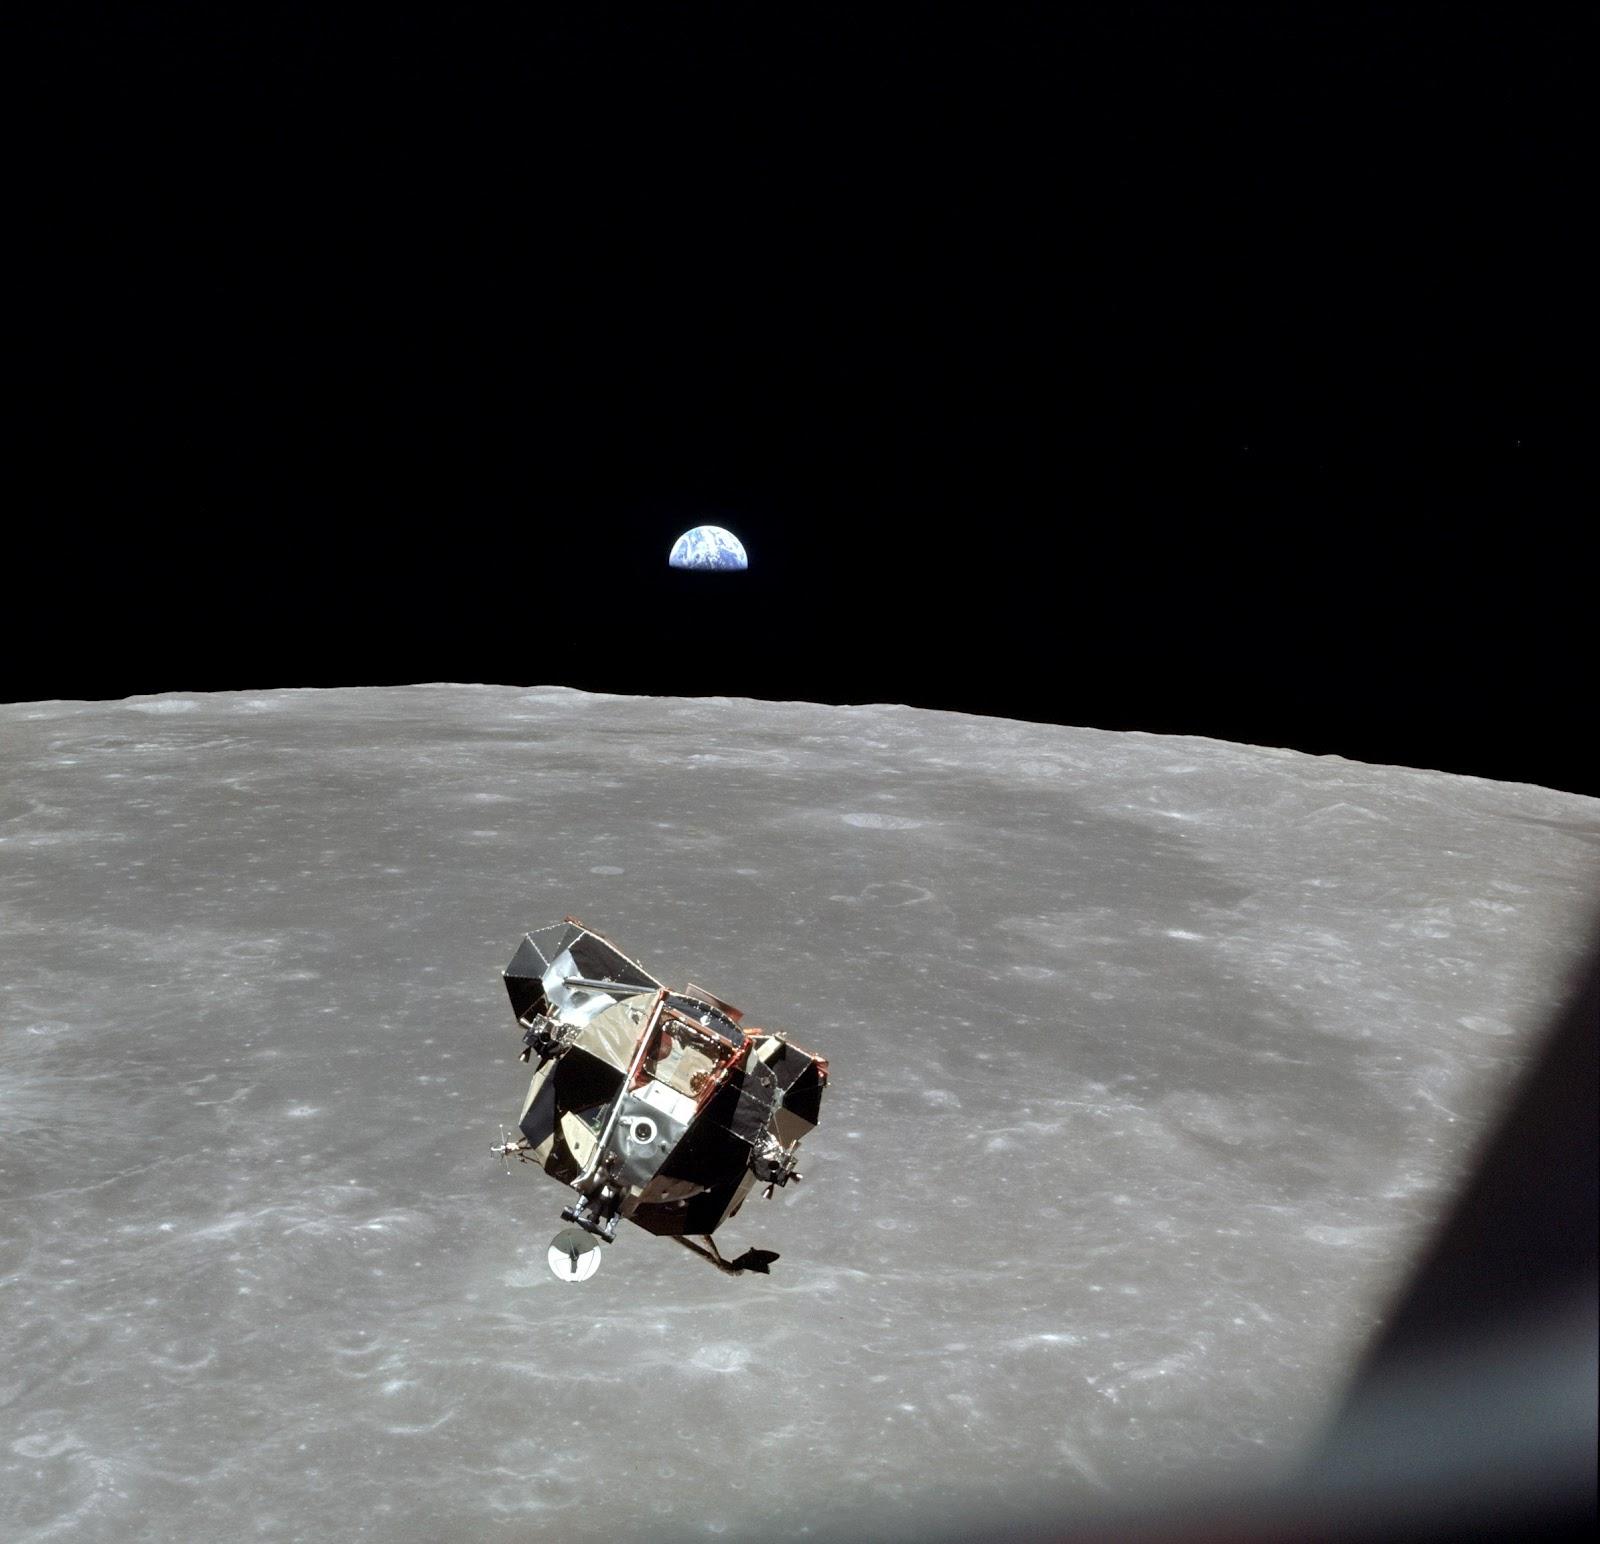 apollo 11 moon landing mystery - photo #1